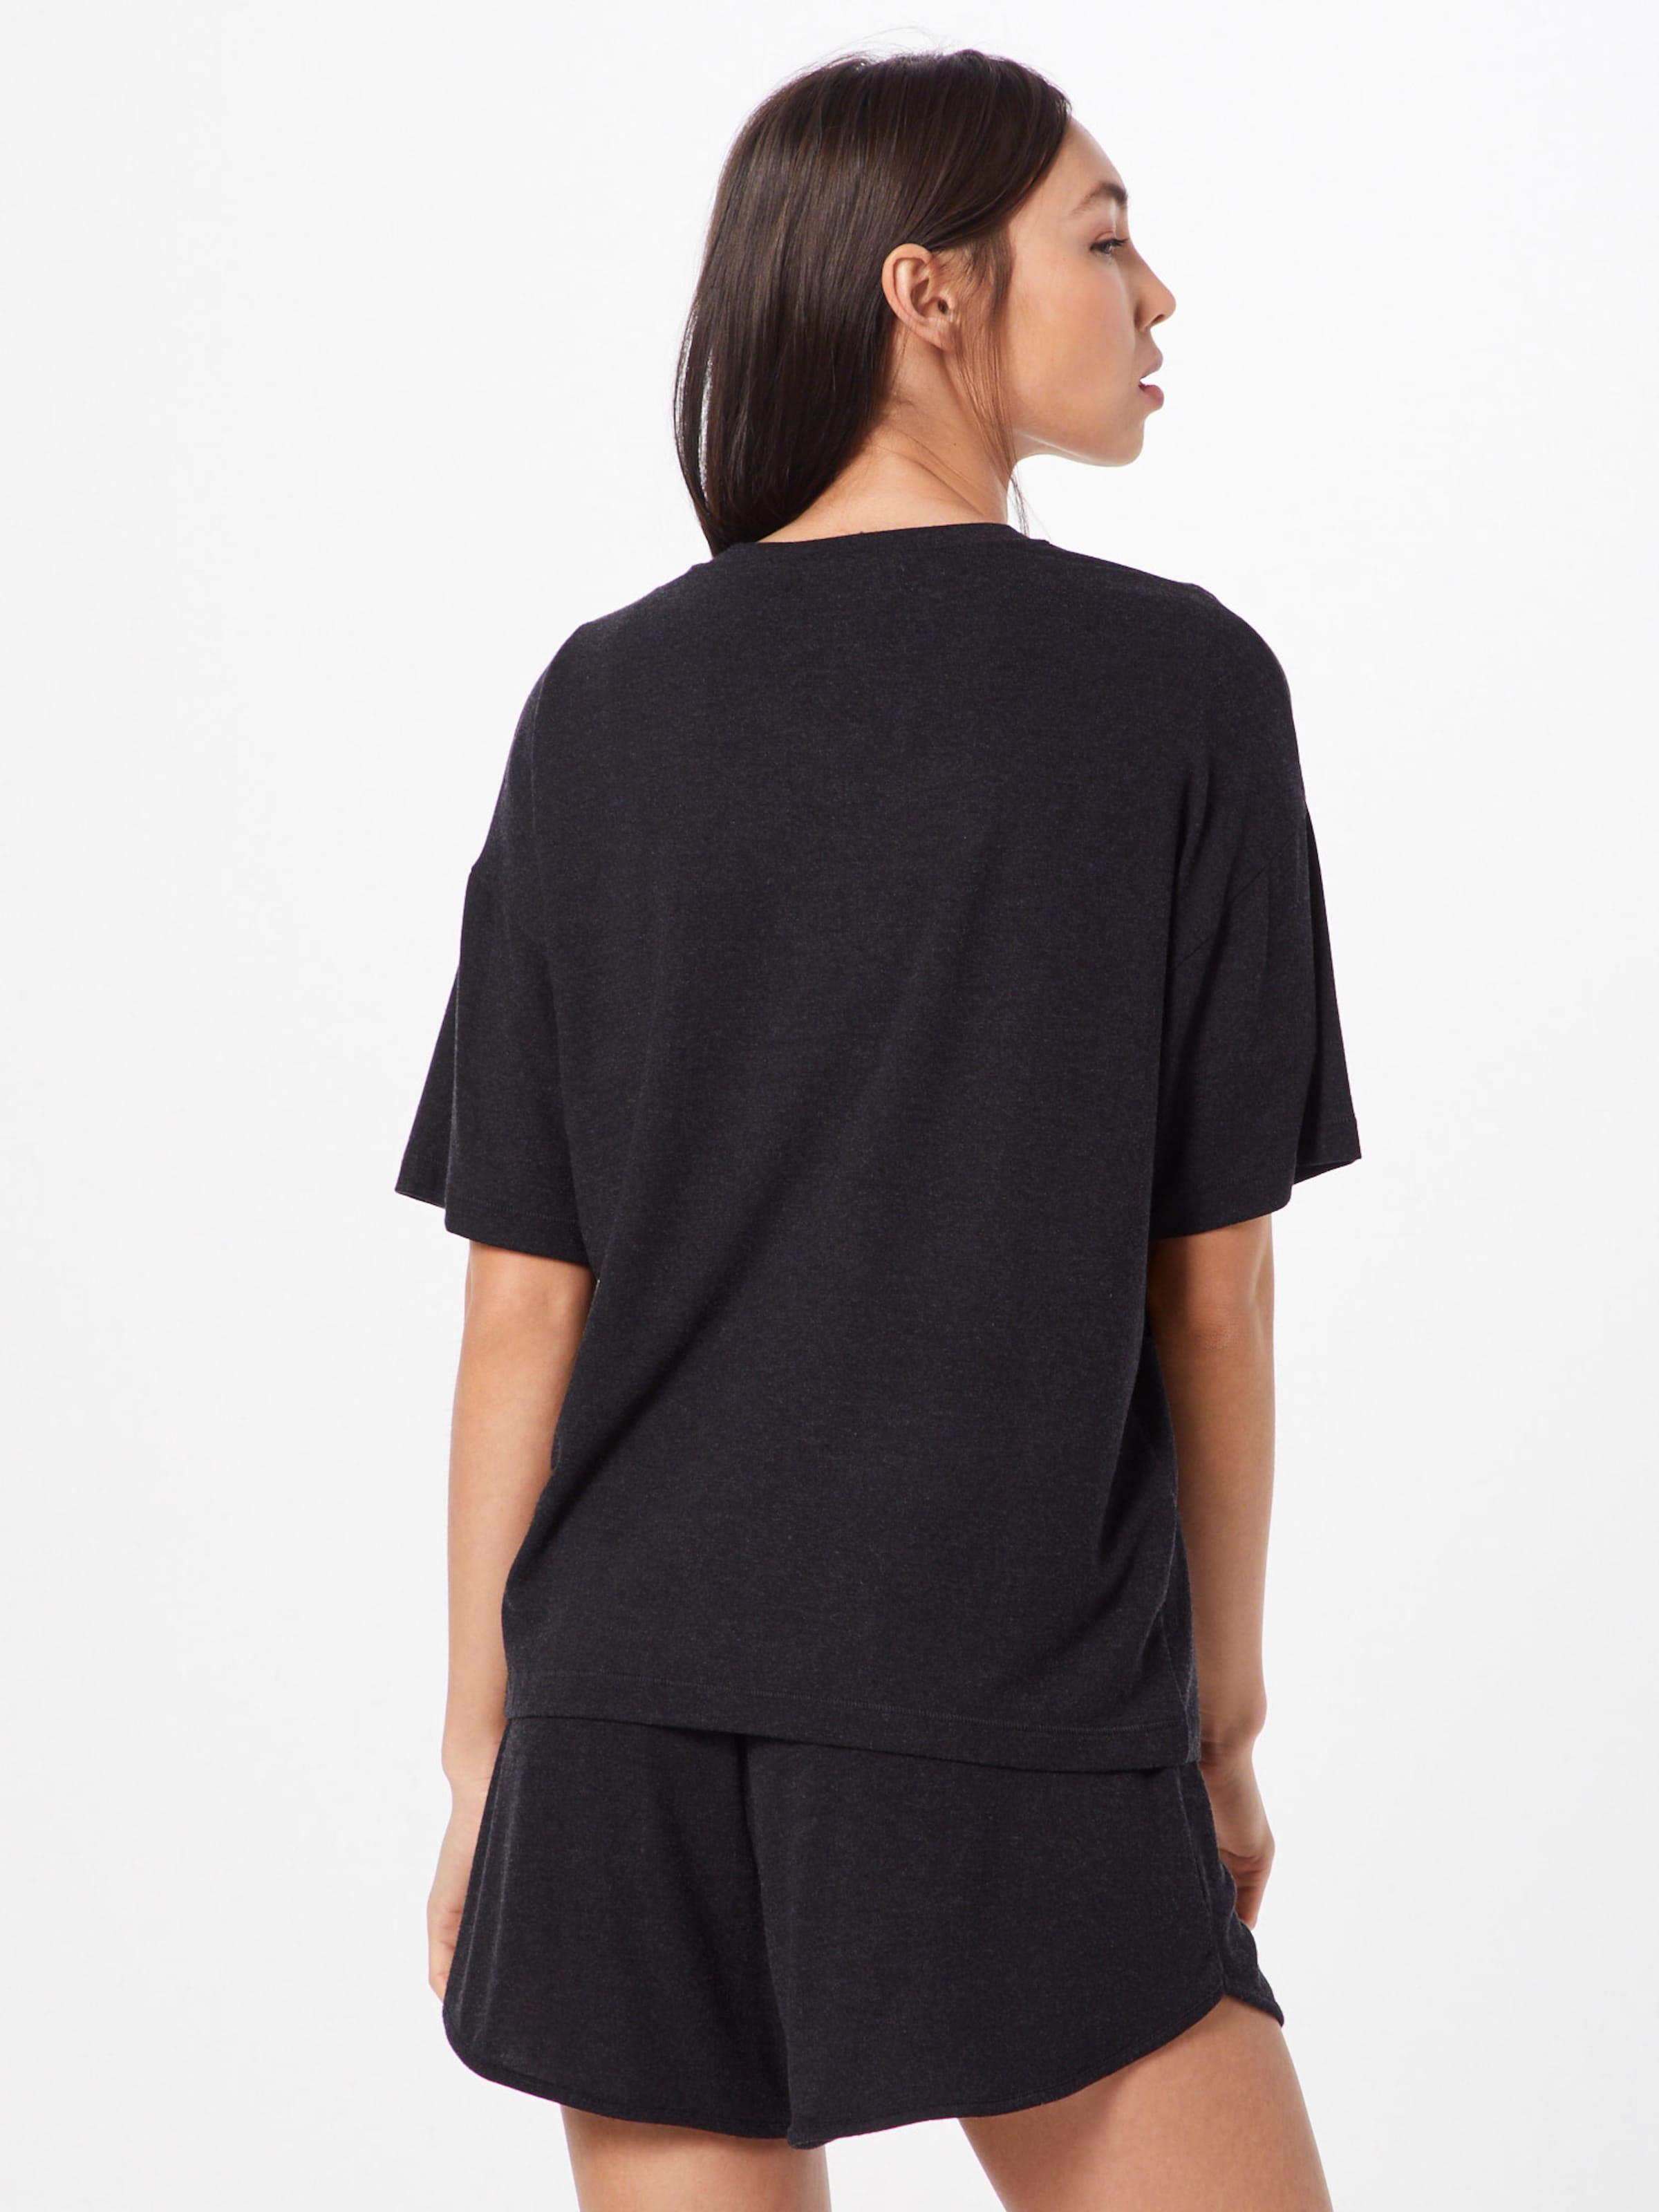 Copenhagen shirt Anthracite Moss T En 80wvnOmN